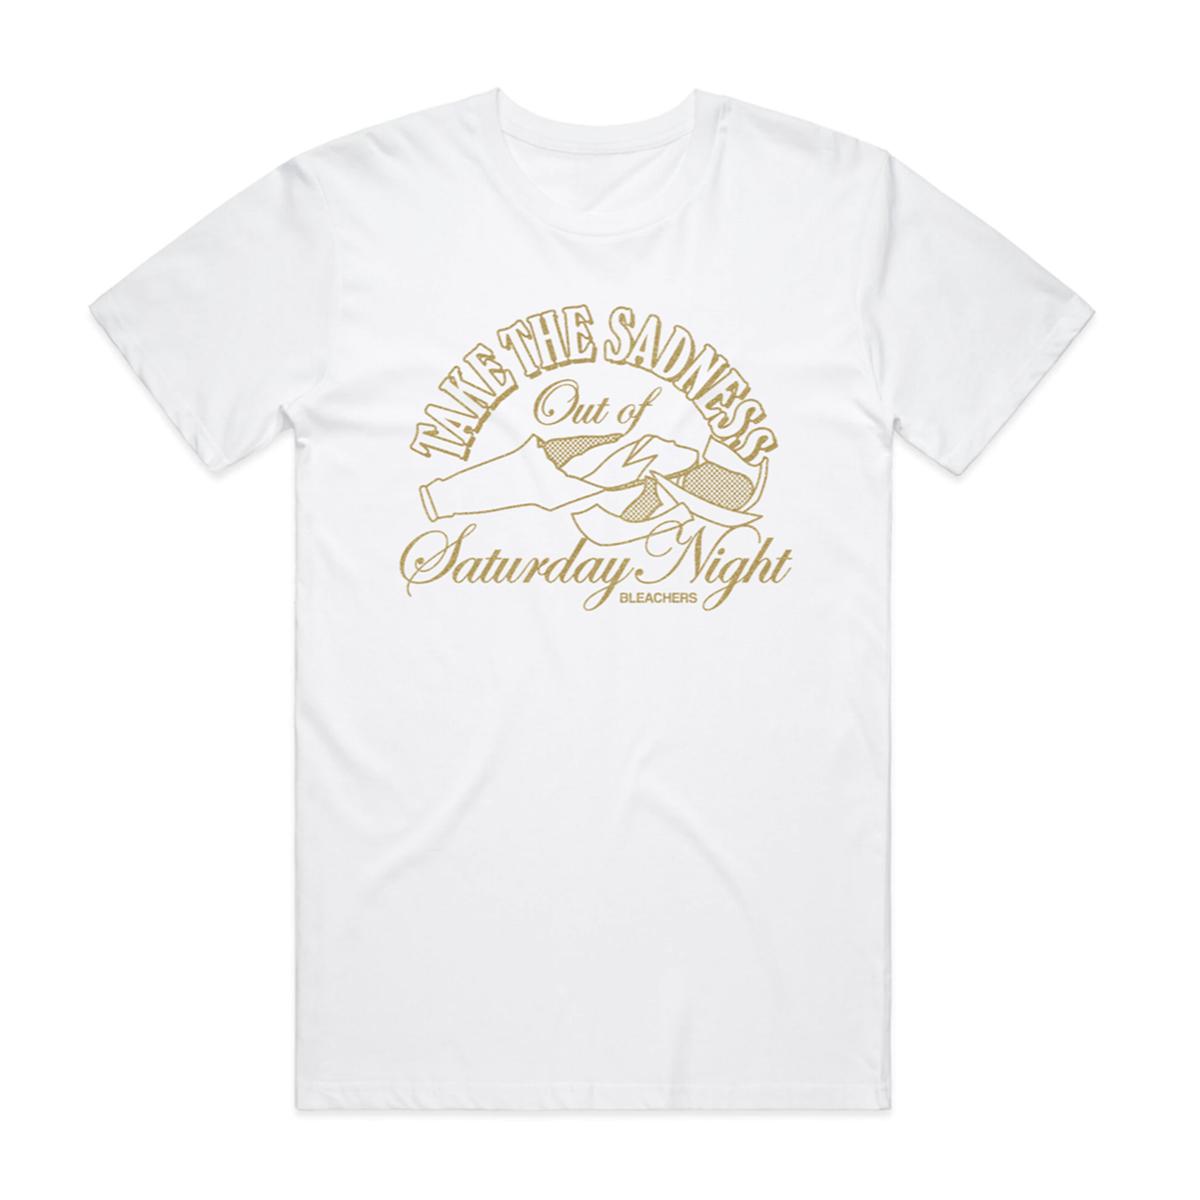 Take the Sadness Out of Saturday Night White Shirt